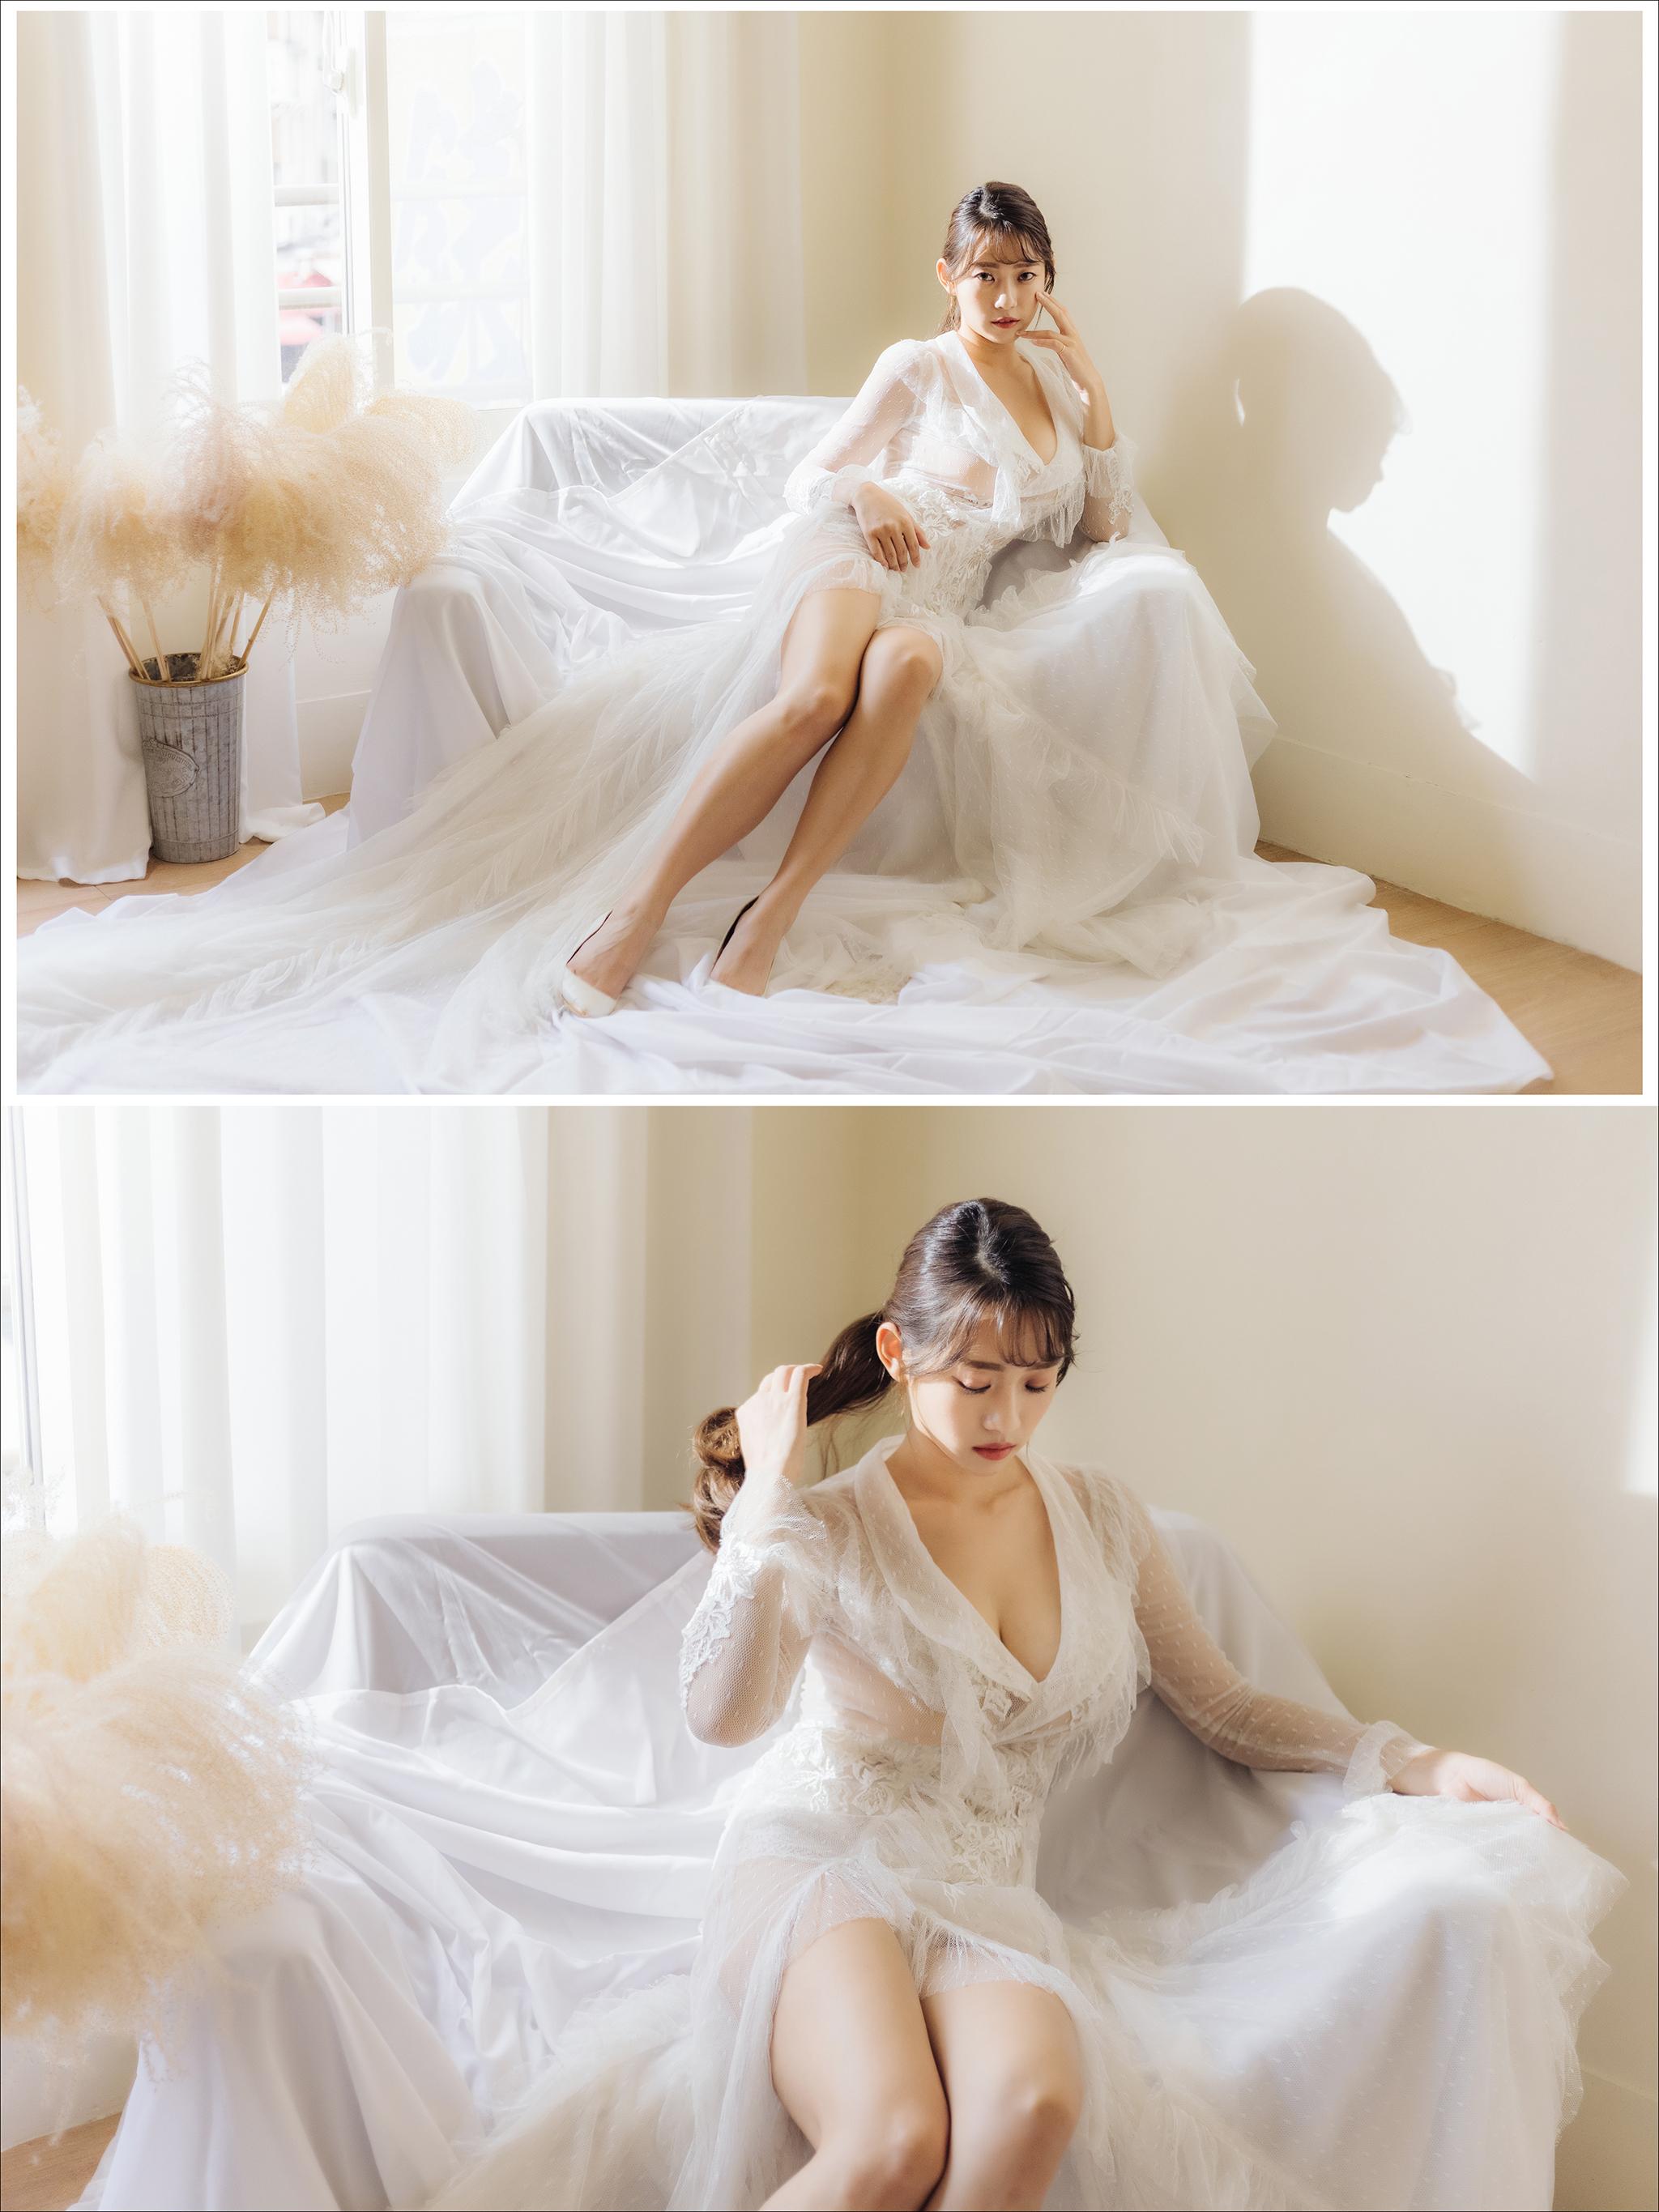 51577451996 0d0277735e o - 【自主婚紗】+江jiang+